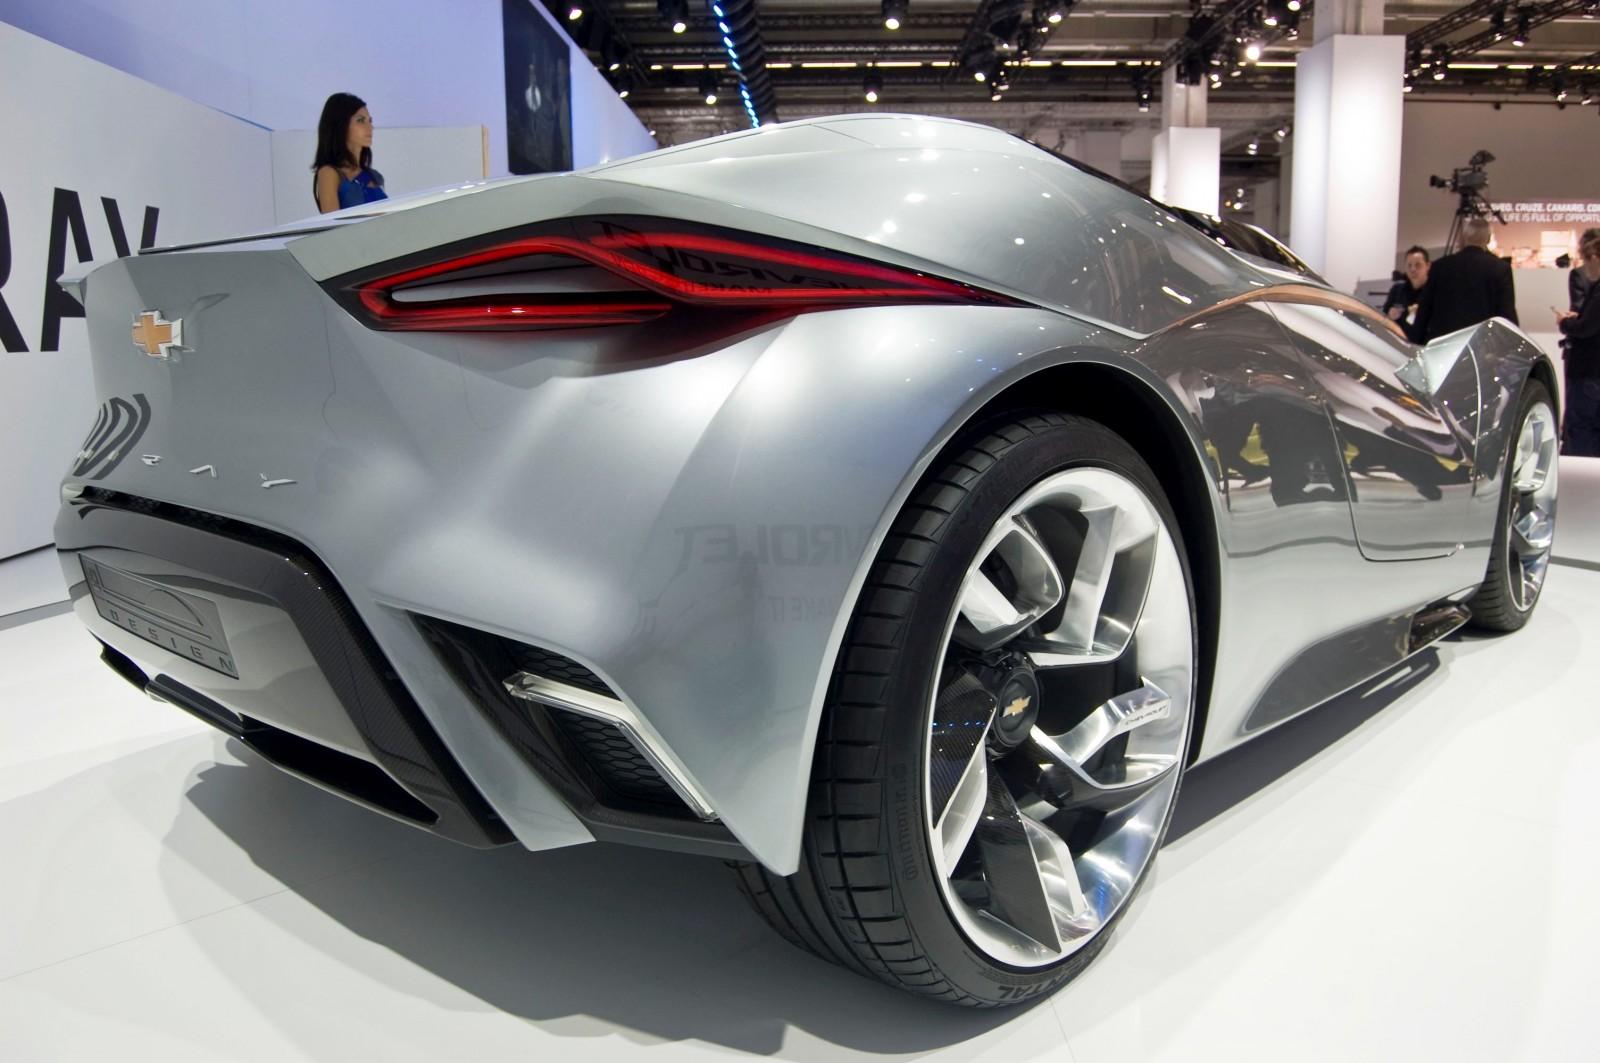 Chevrolet Fnr Sports Concept 48 Images Sepsis Garage The Electric Car Best Of Shanghai 2017 X 18 Photos